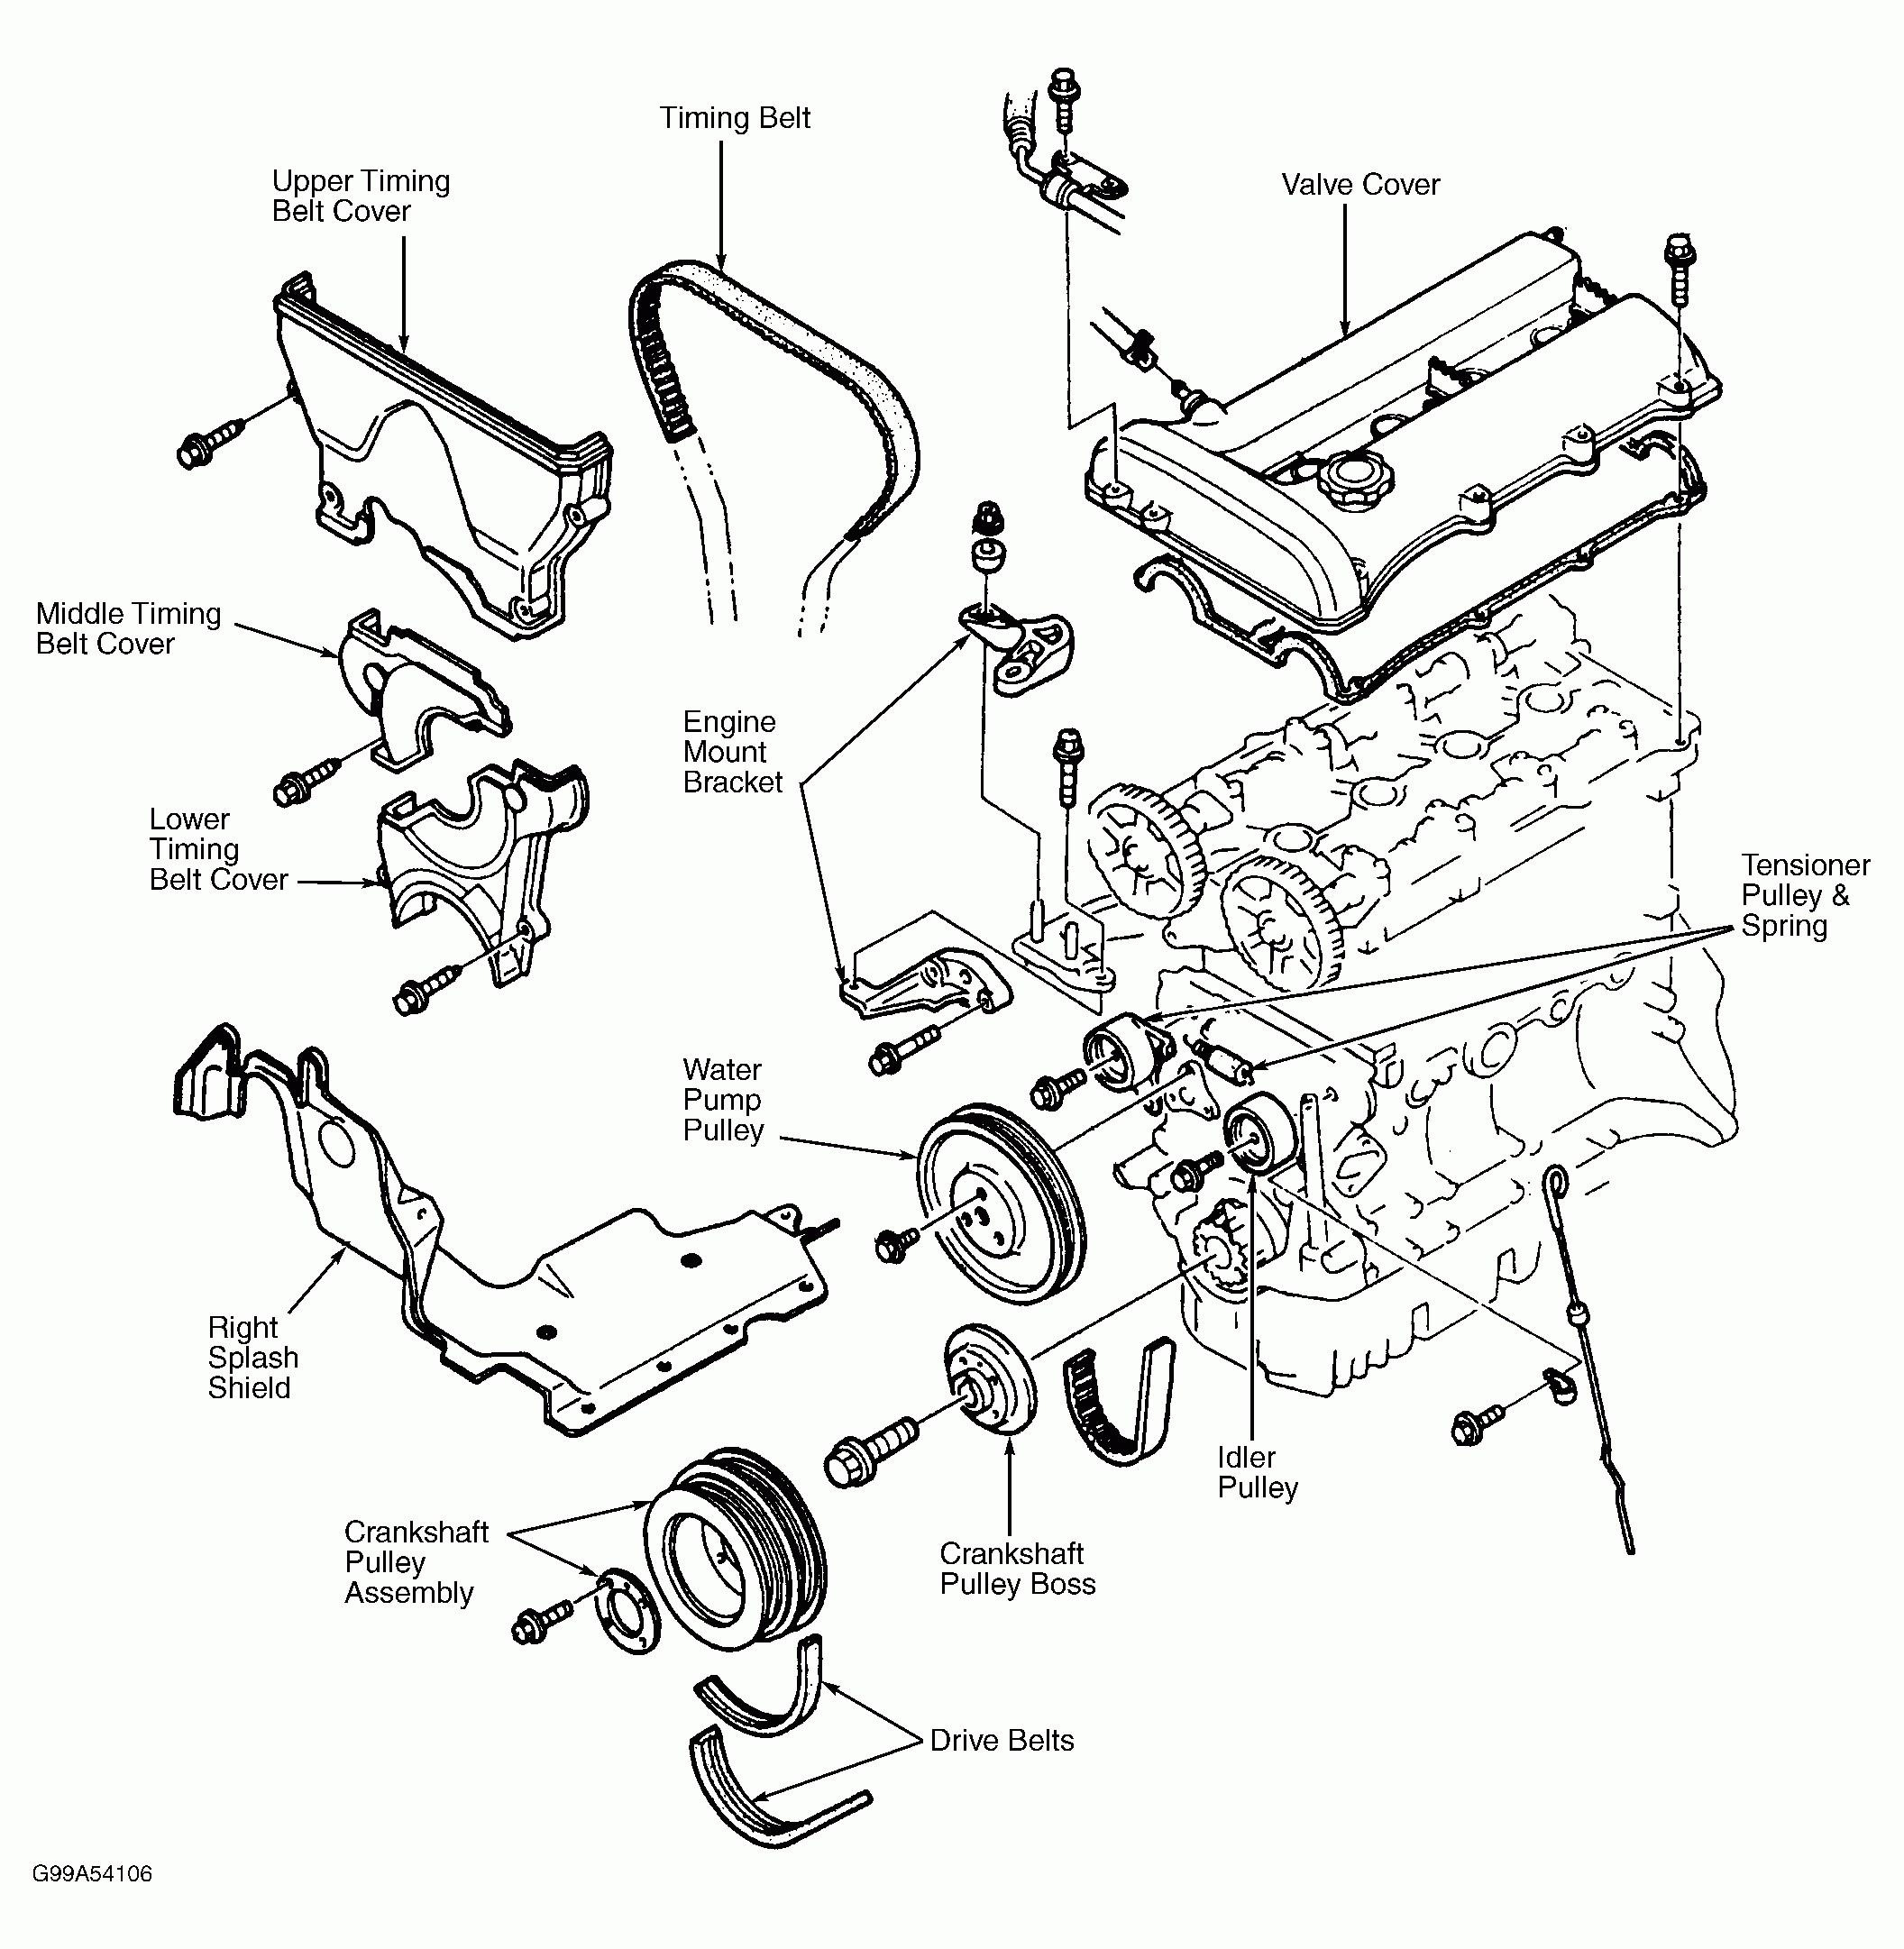 2000 Mazda Protege Engine Diagram - Wiring Diagrams User